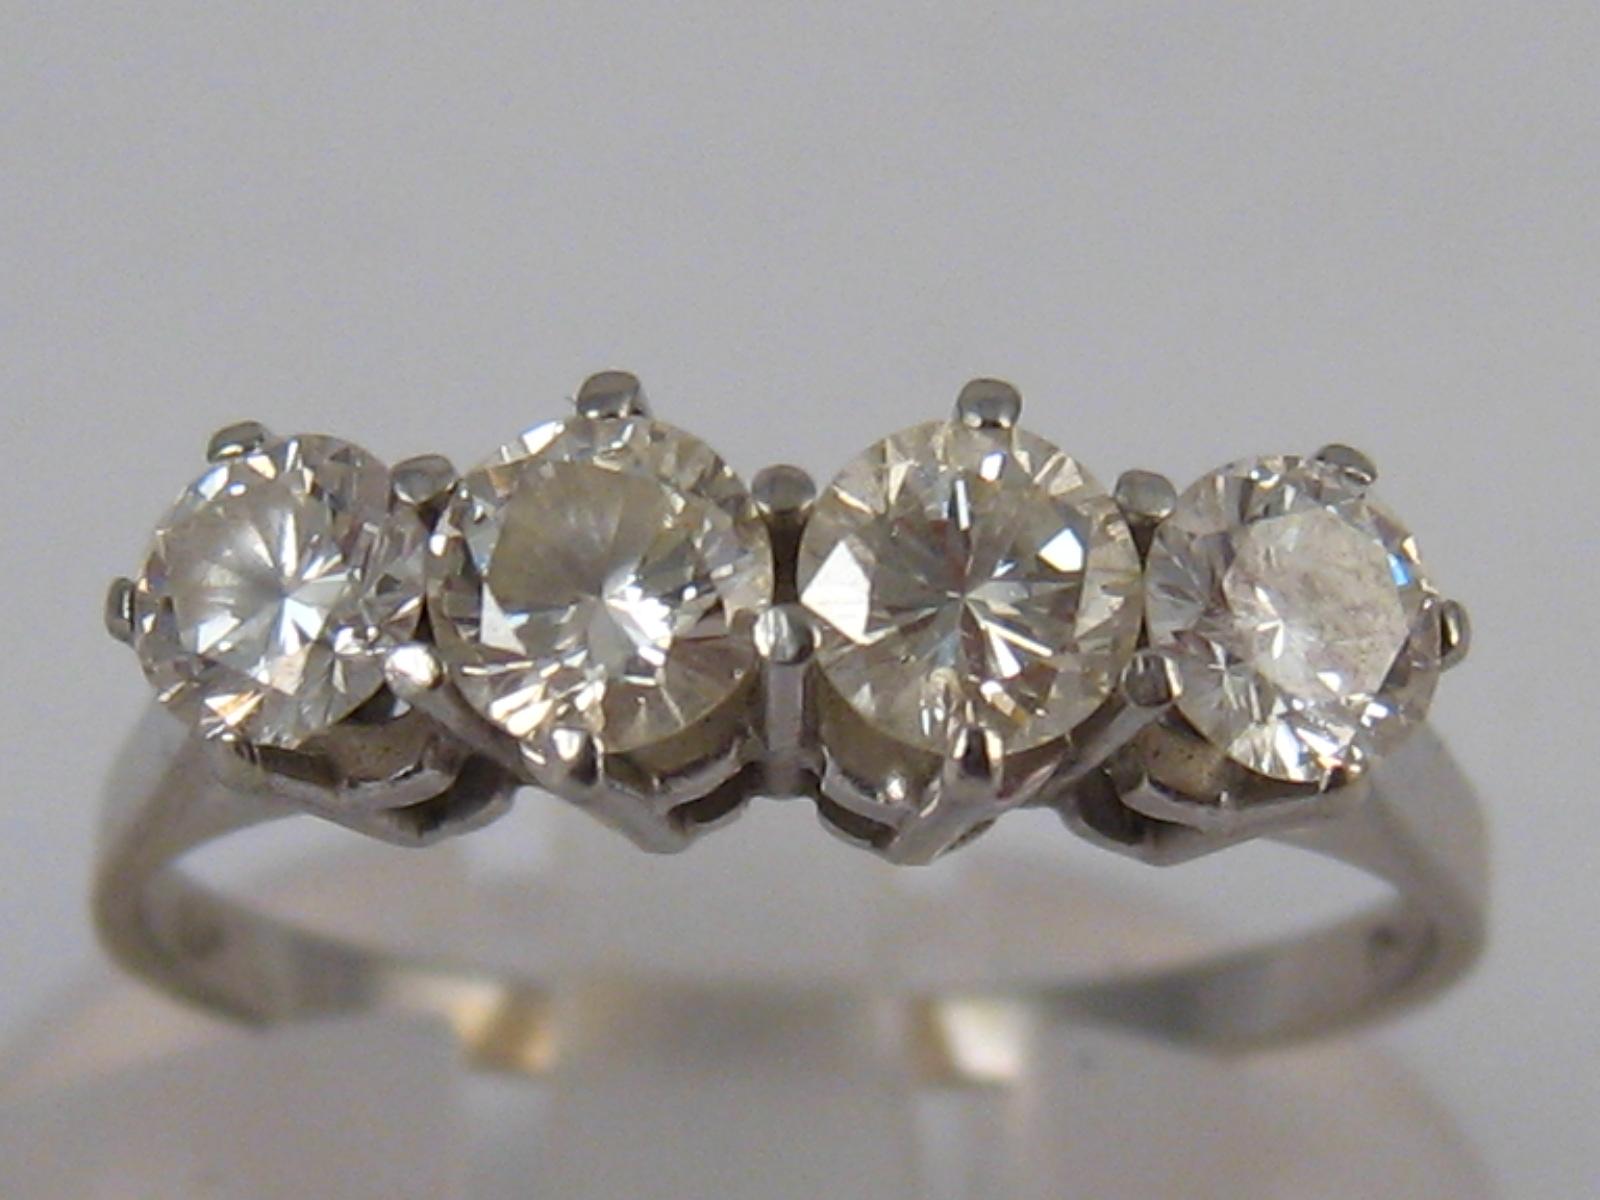 A white metal (tests 18 carat gold) four stone diamond ring, estimated total diamond content 0.75-0.